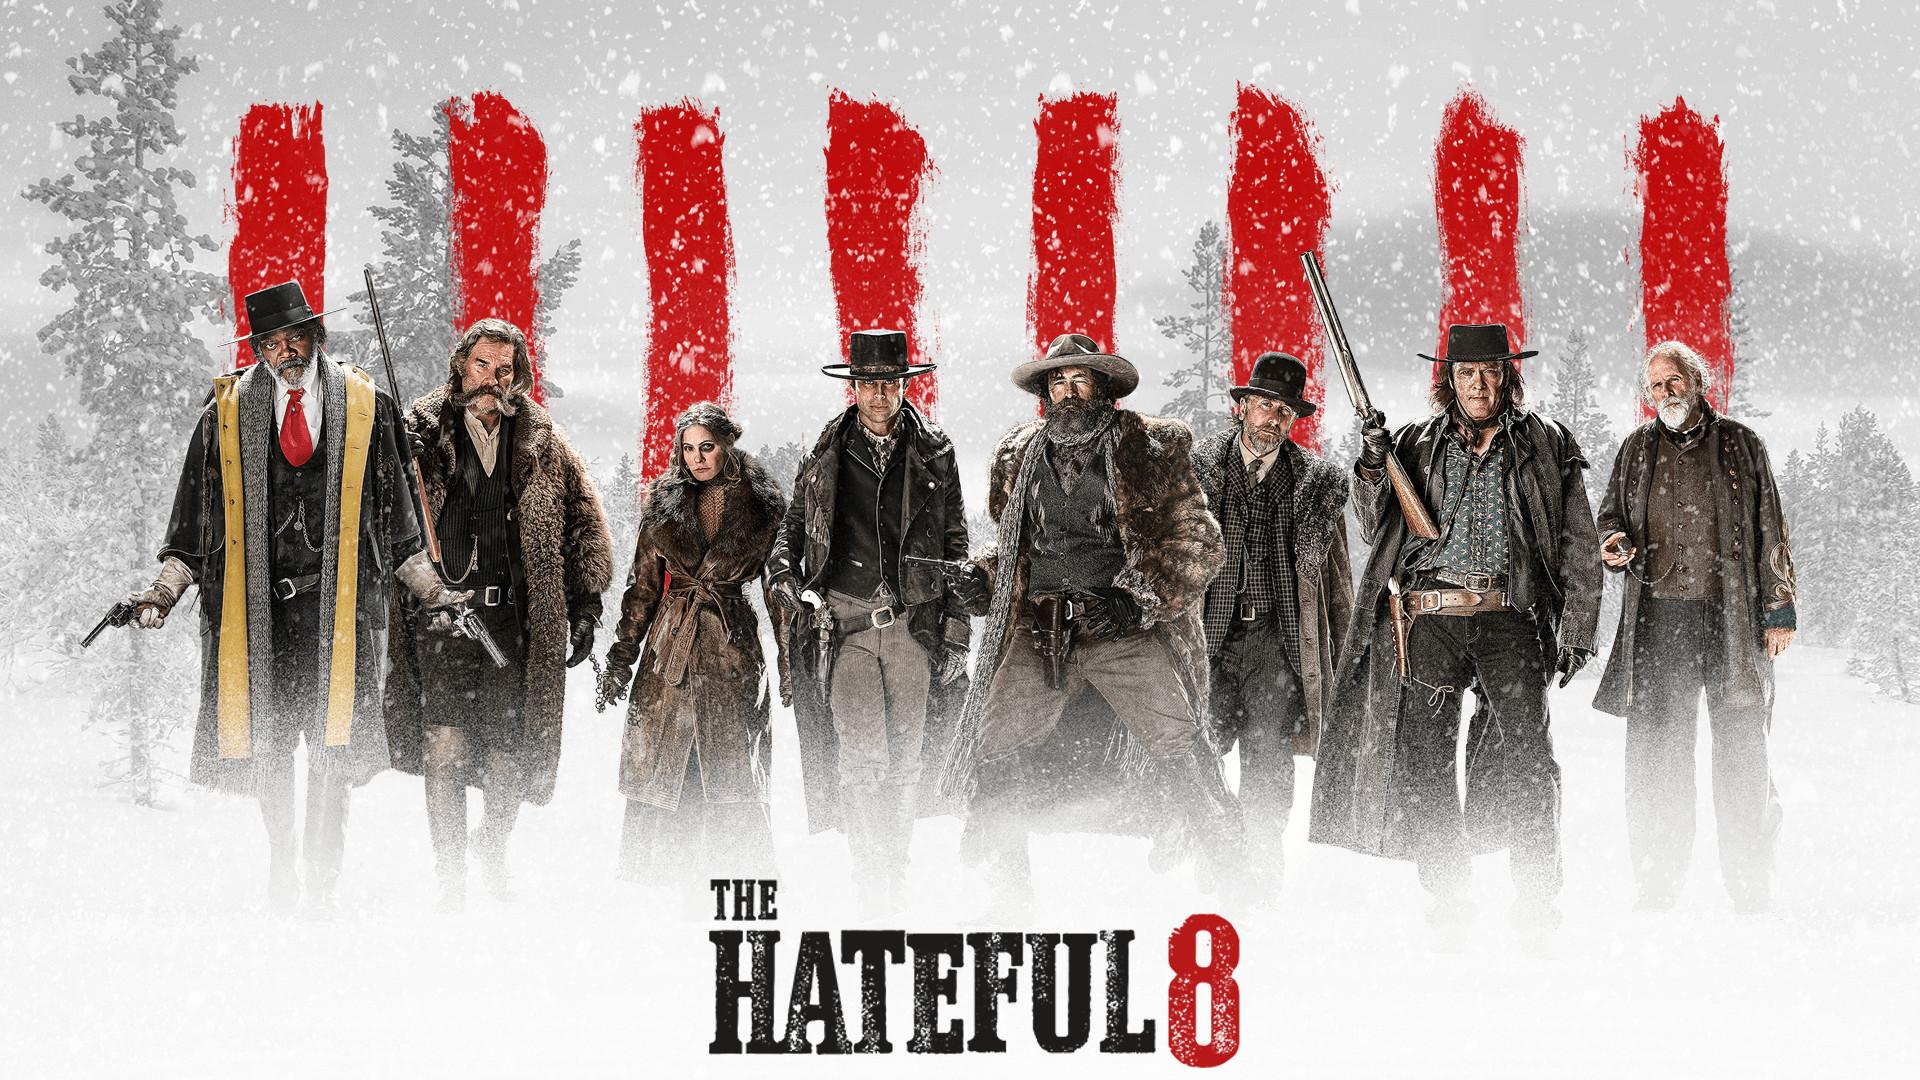 filmkritik-lohnt-sich-kino-hateful-8-hateful-eight-thumbnail